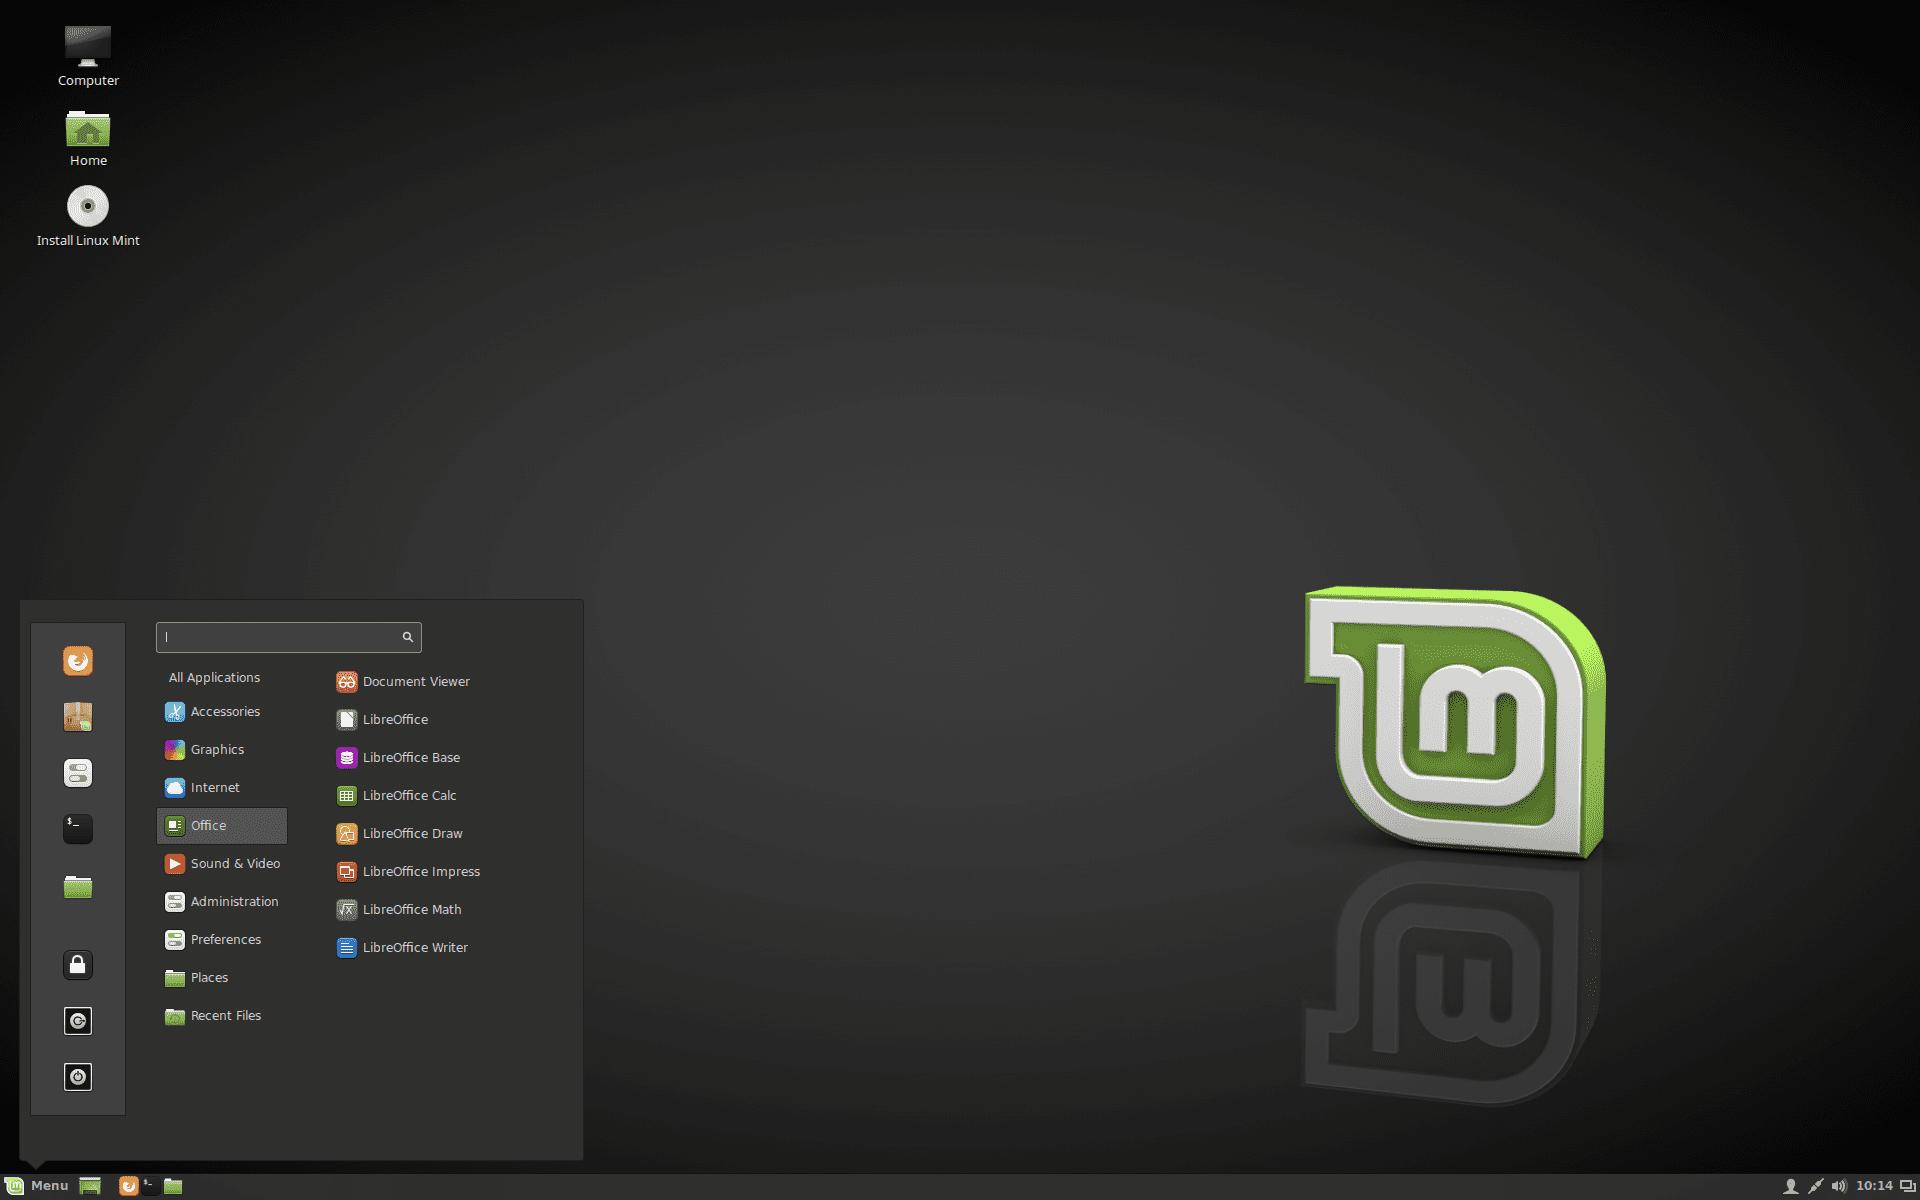 Linux Mint 18 Beta Ya Disponible Para Descarga